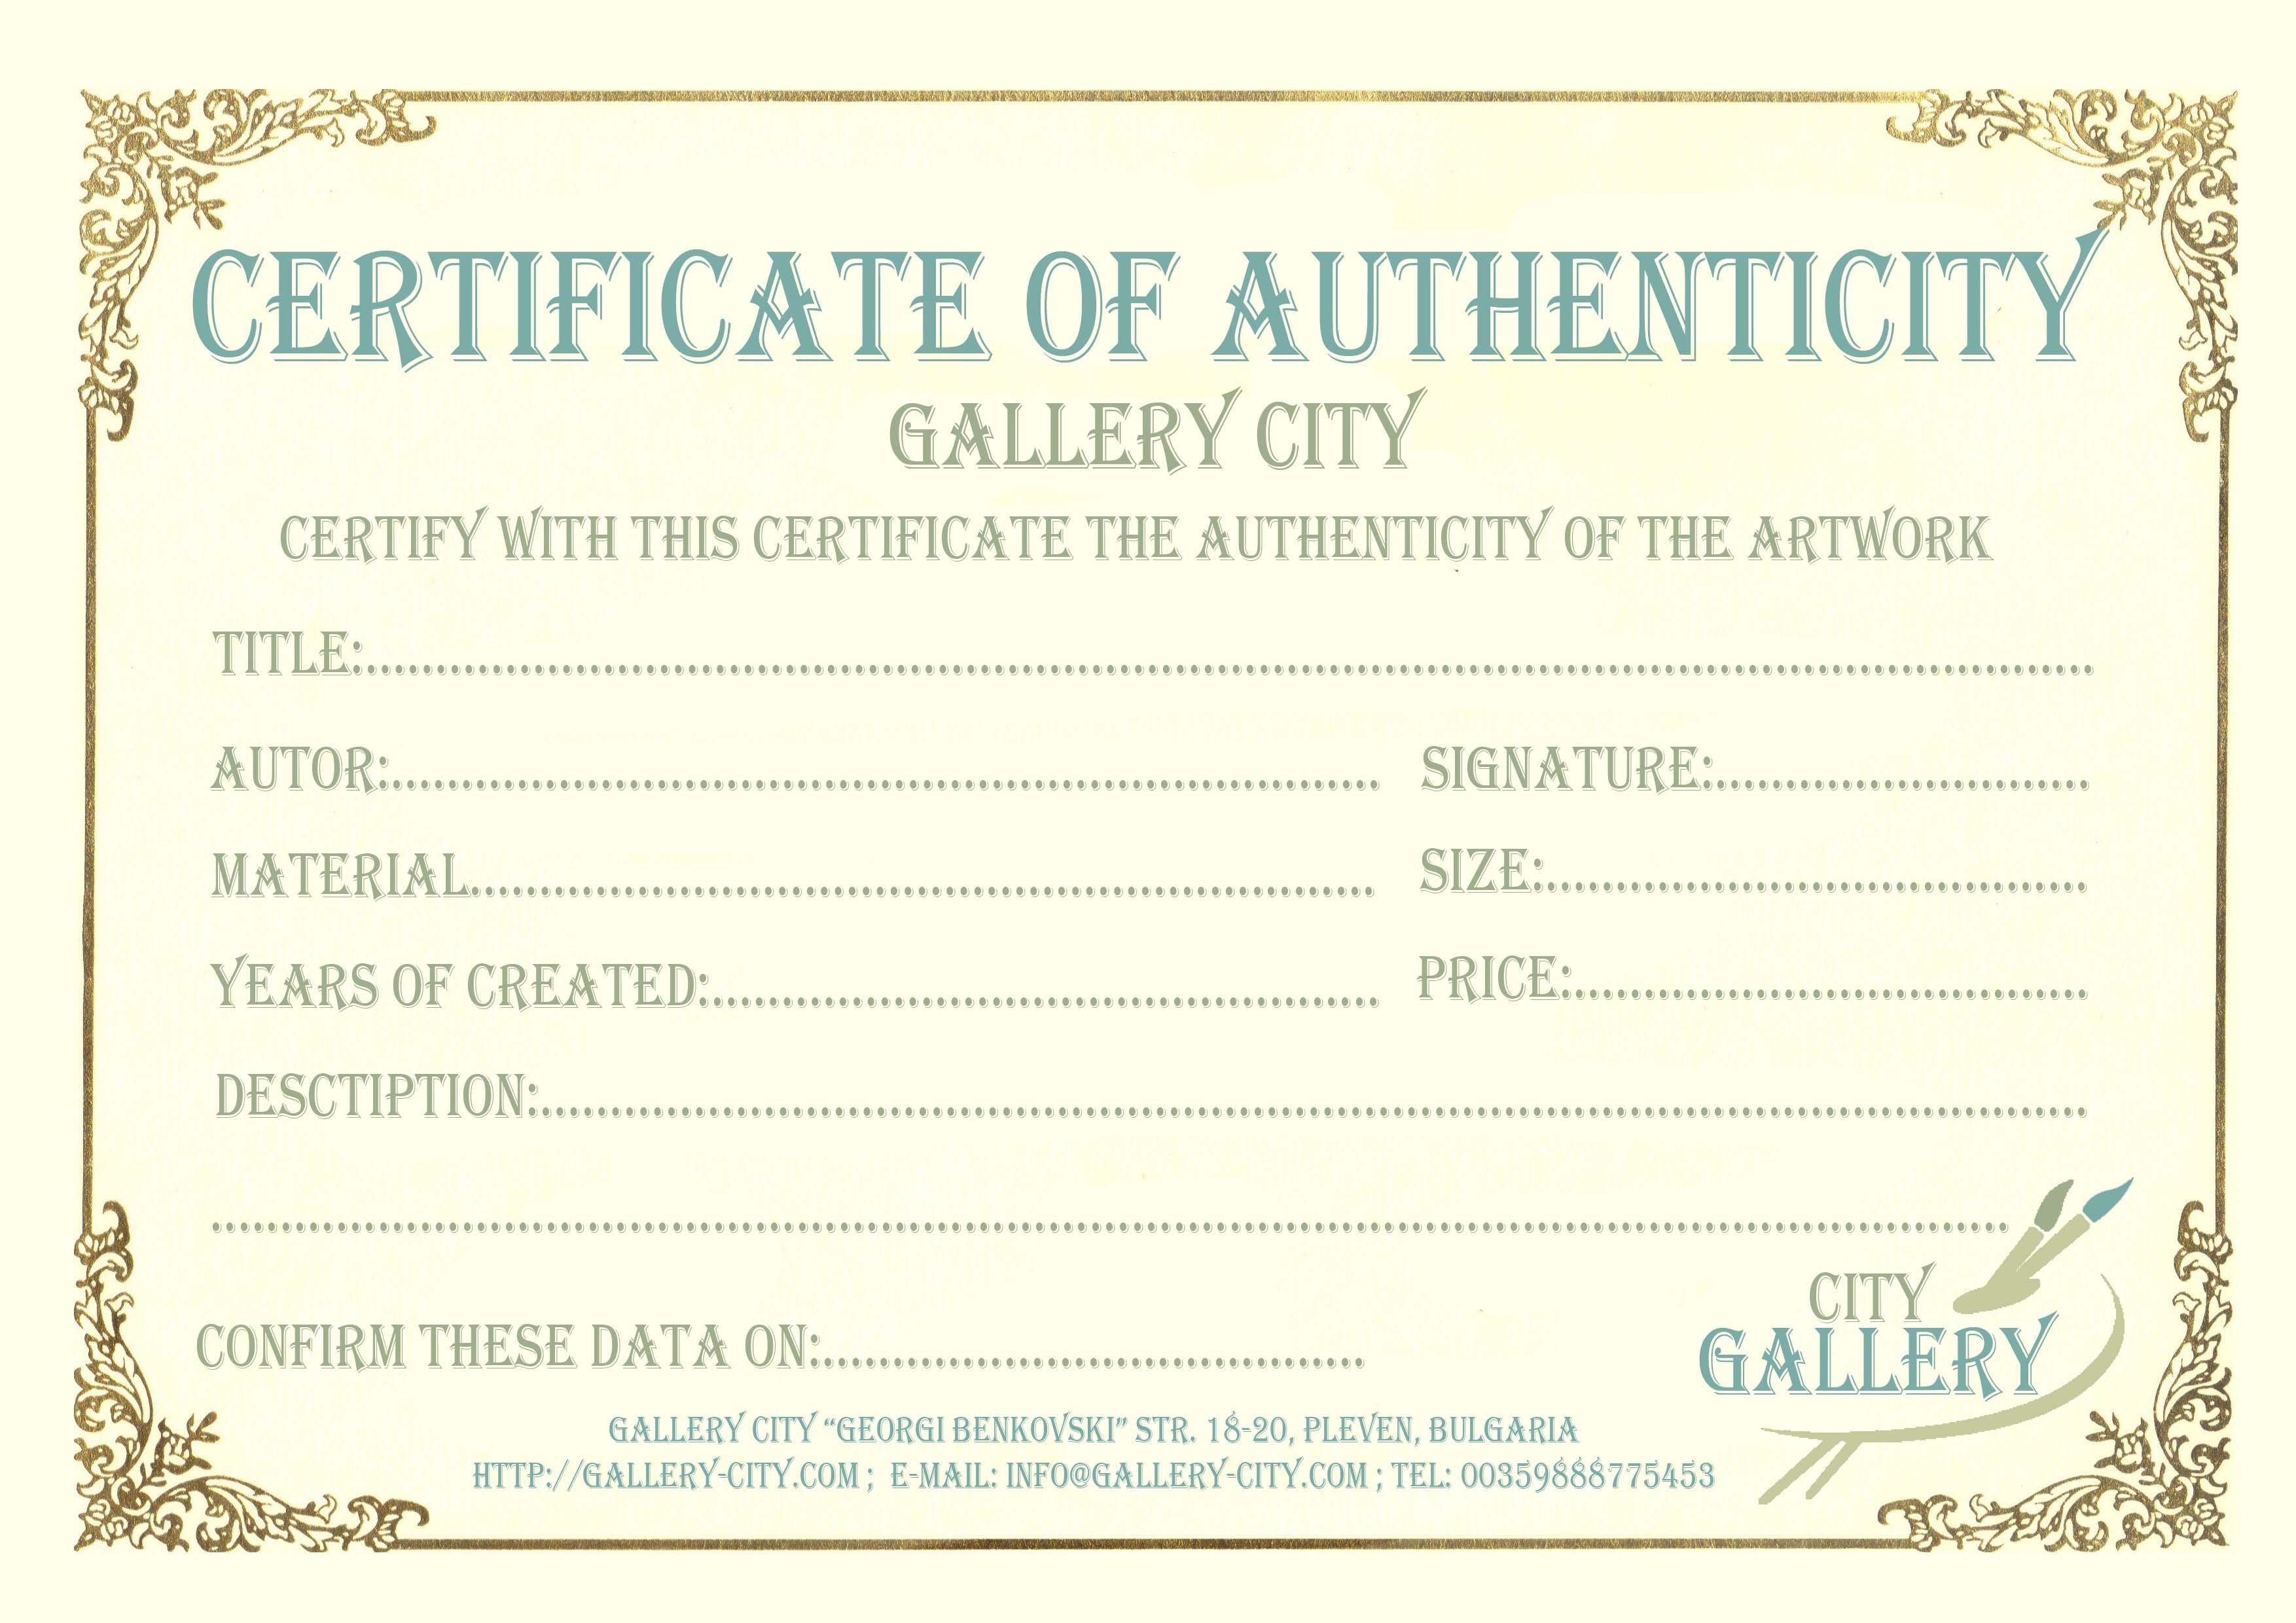 Certificate Authenticity Template Art Authenticity Regarding Photography Certificate Of Authenticity Template